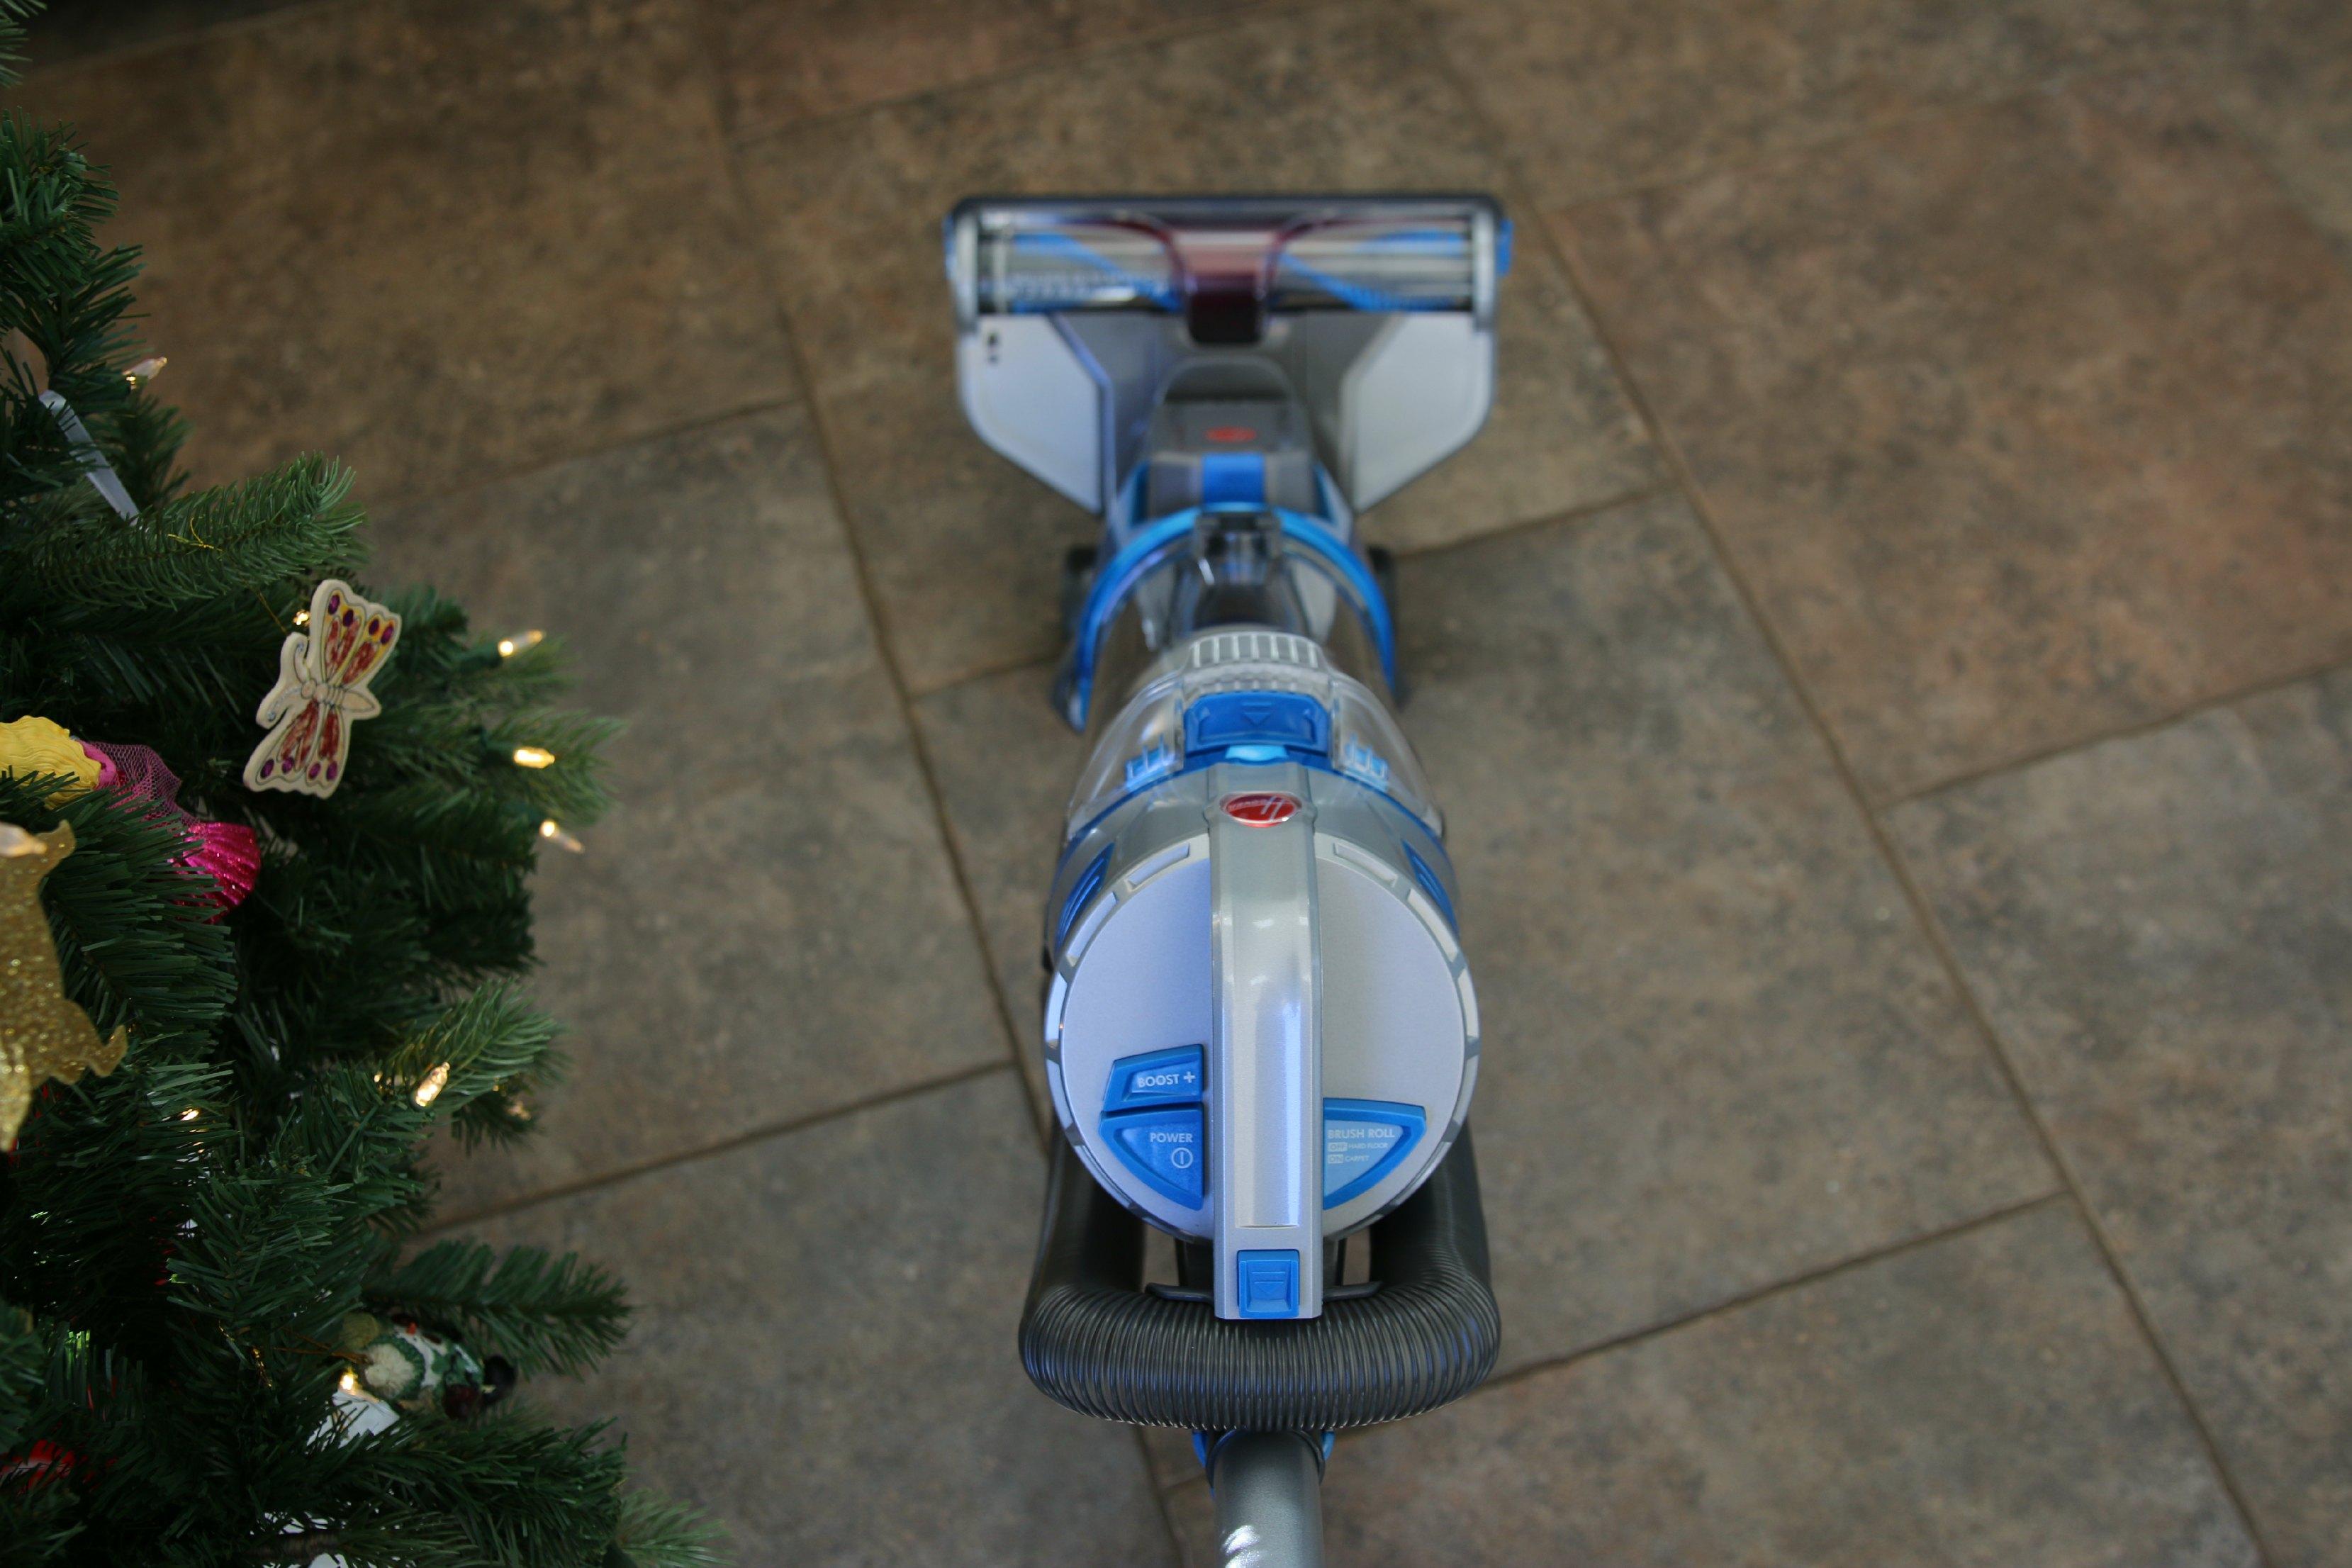 hoover vacuum cordless